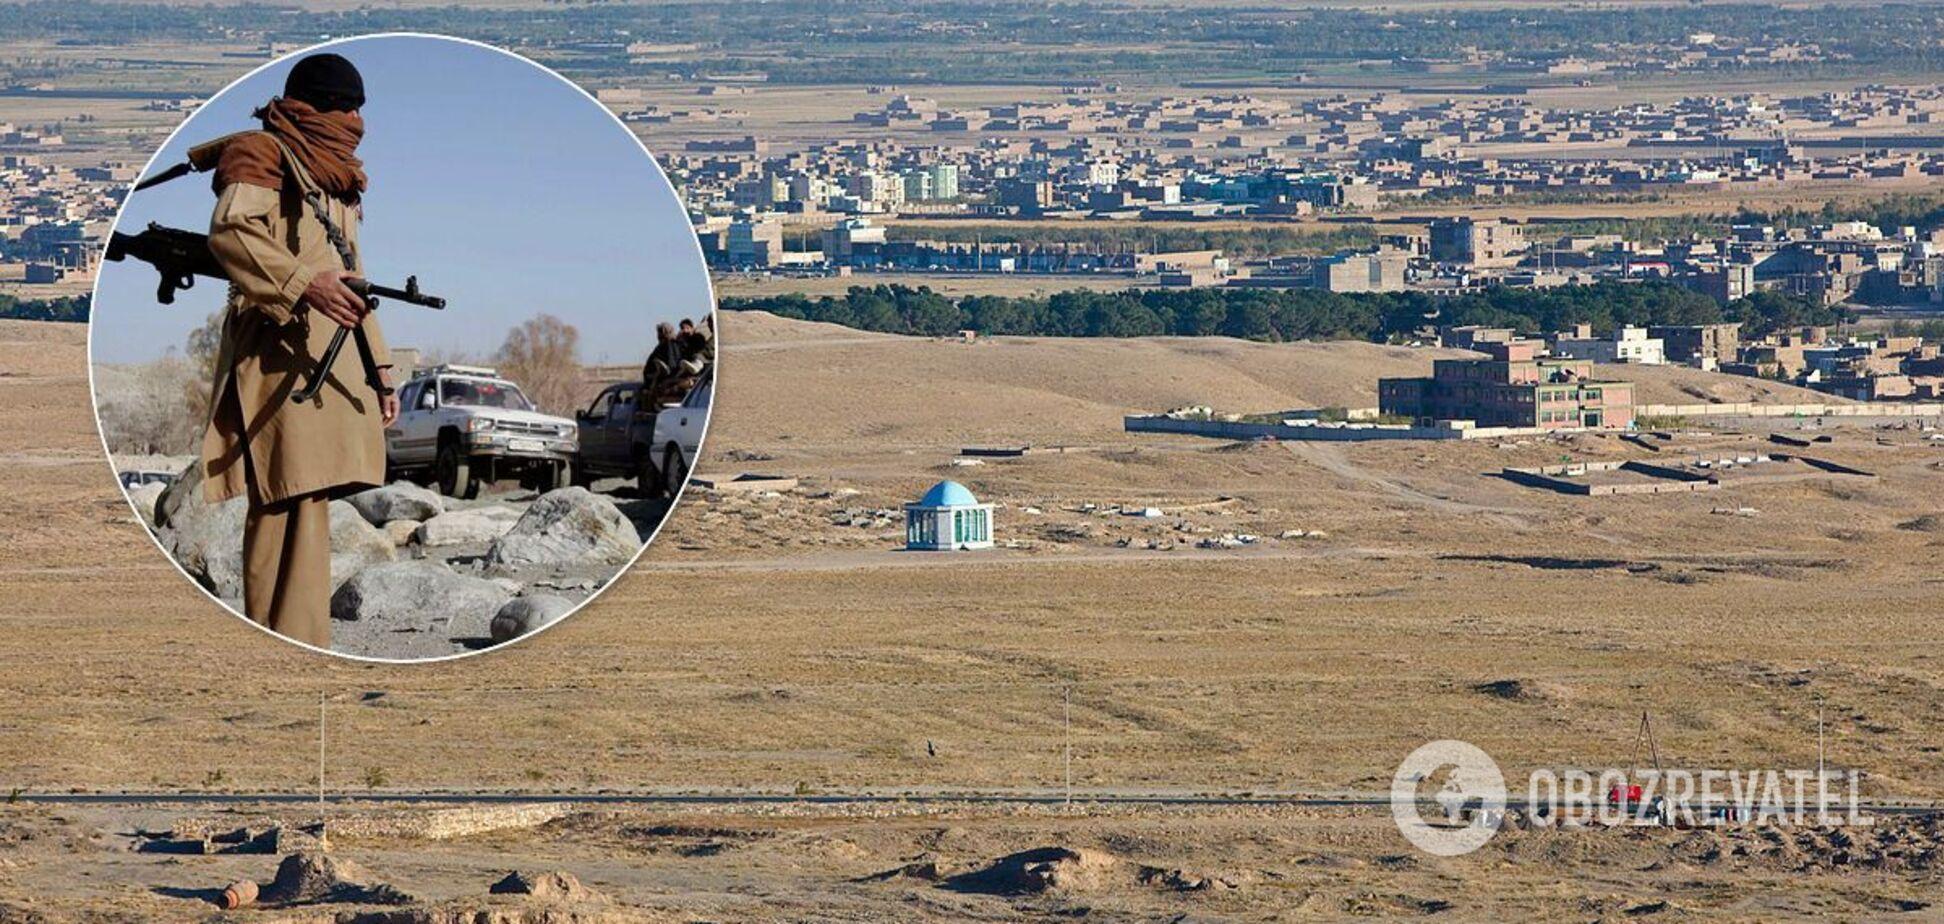 В Афганистане боевики 'Талибана' захватили автобус с 45 пассажирами